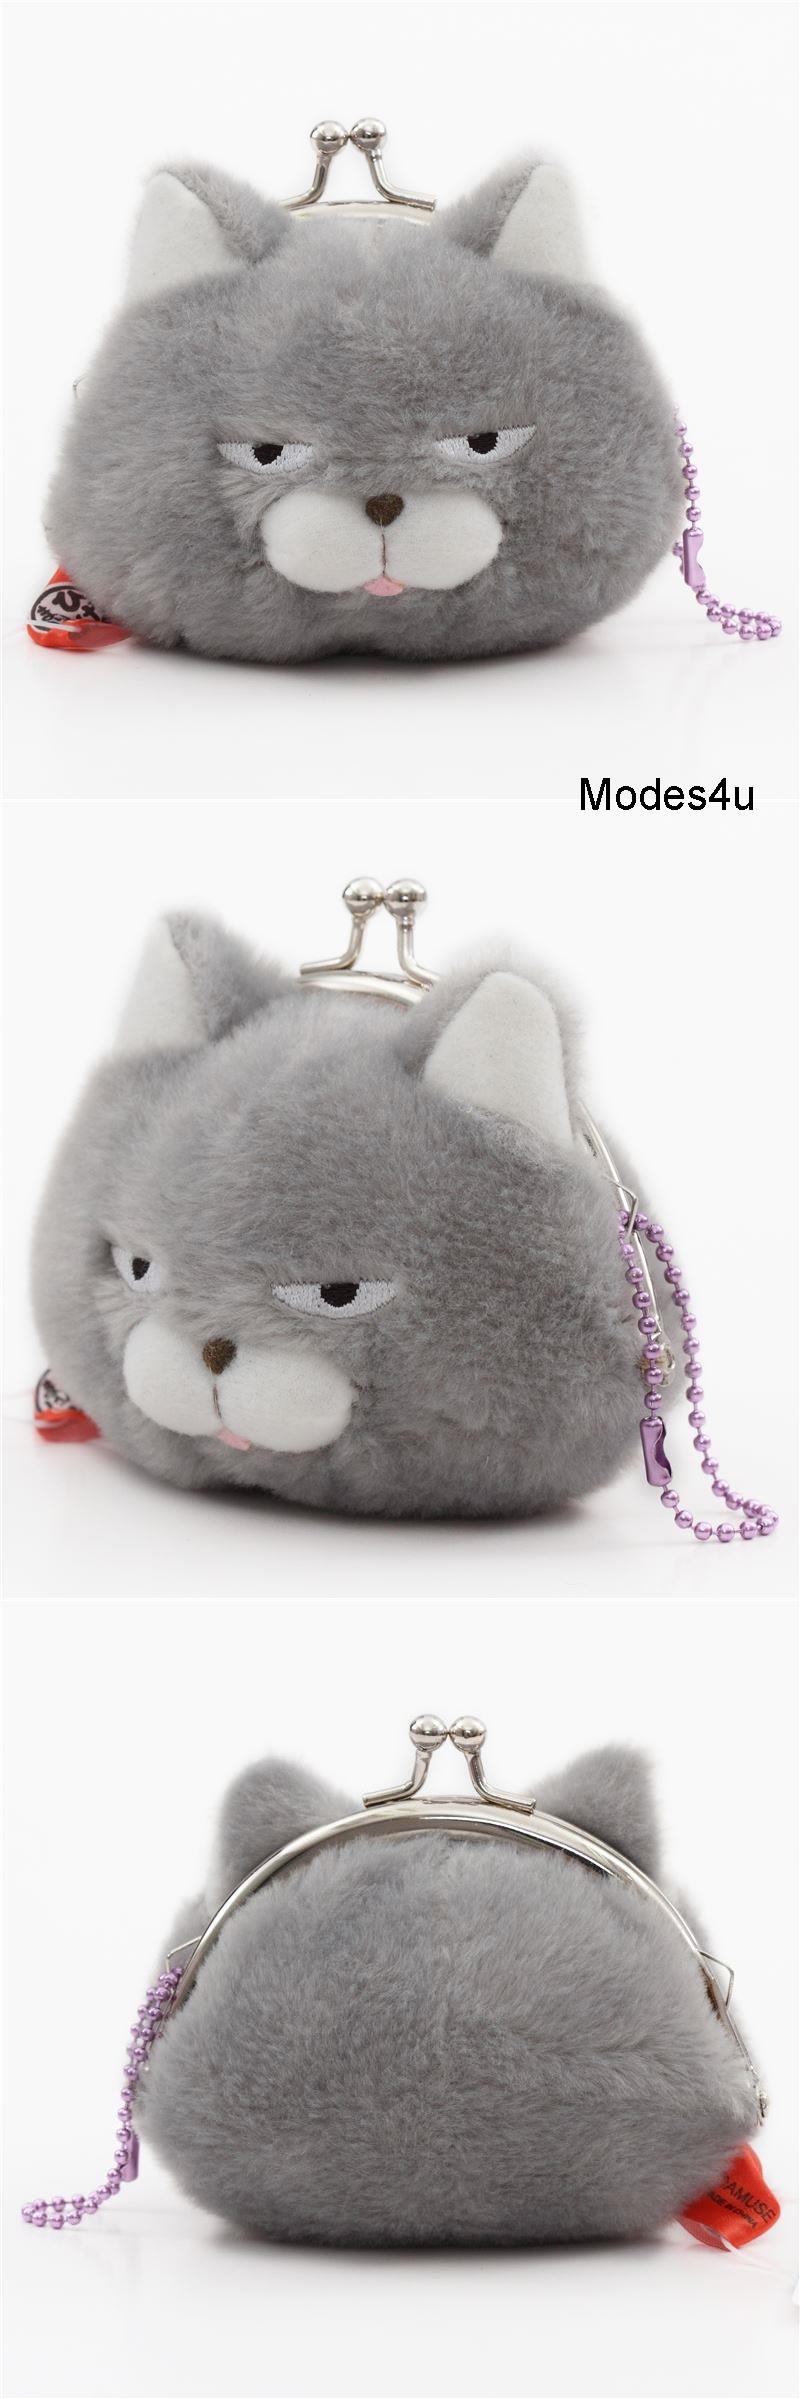 Kawaii Plush Toys image by Modes4u Grey cat plush, Cat